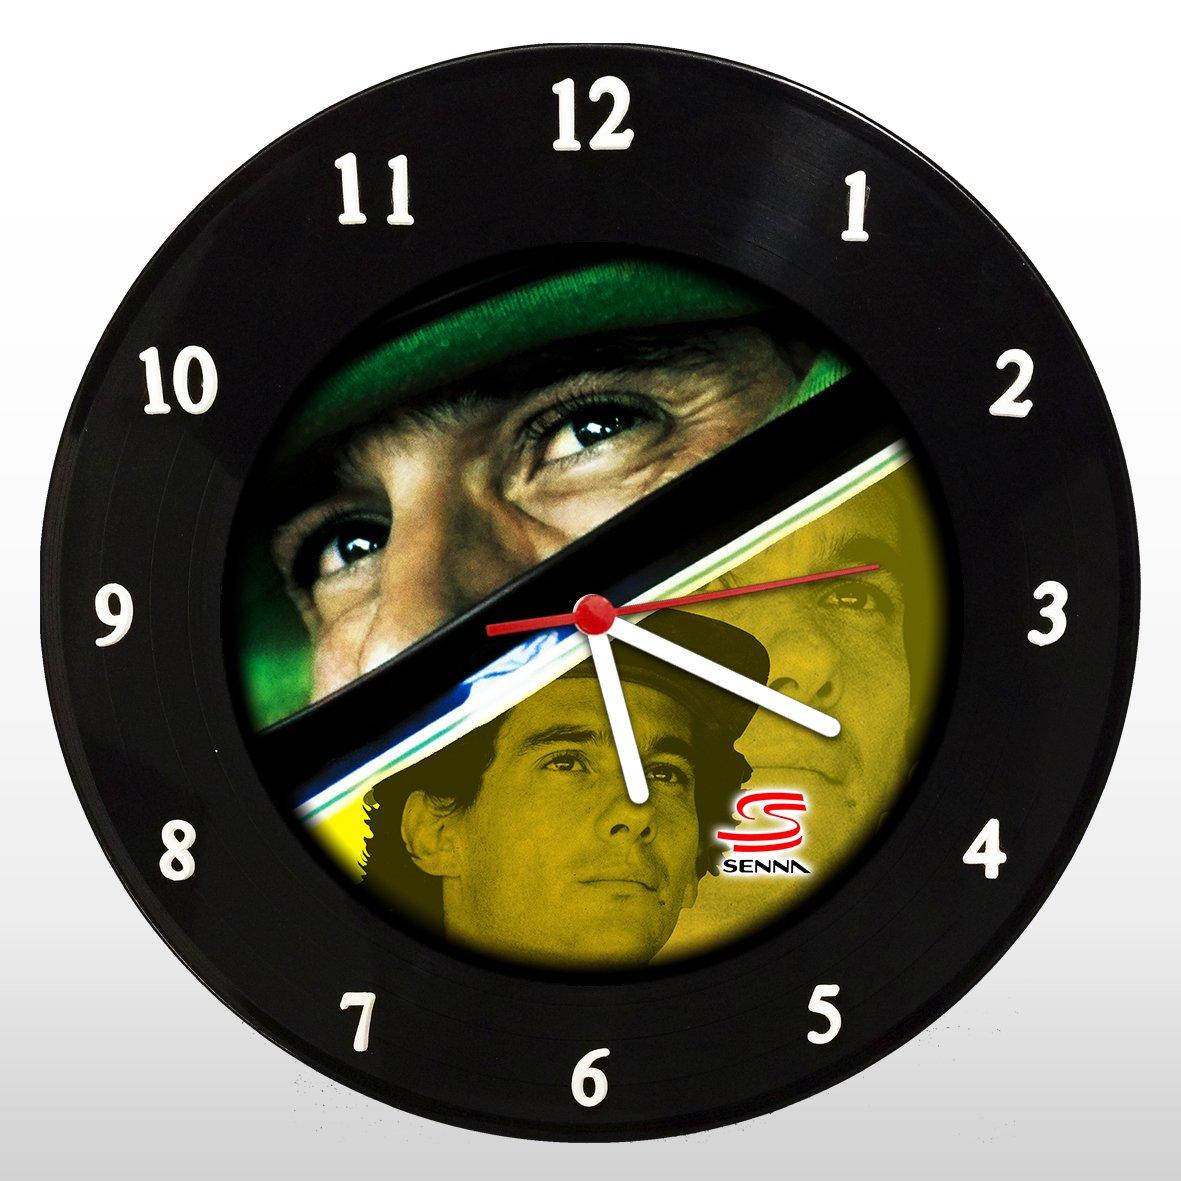 Ayrton Senna - Relógio de Parede em Disco de Vinil - Mr. Rock